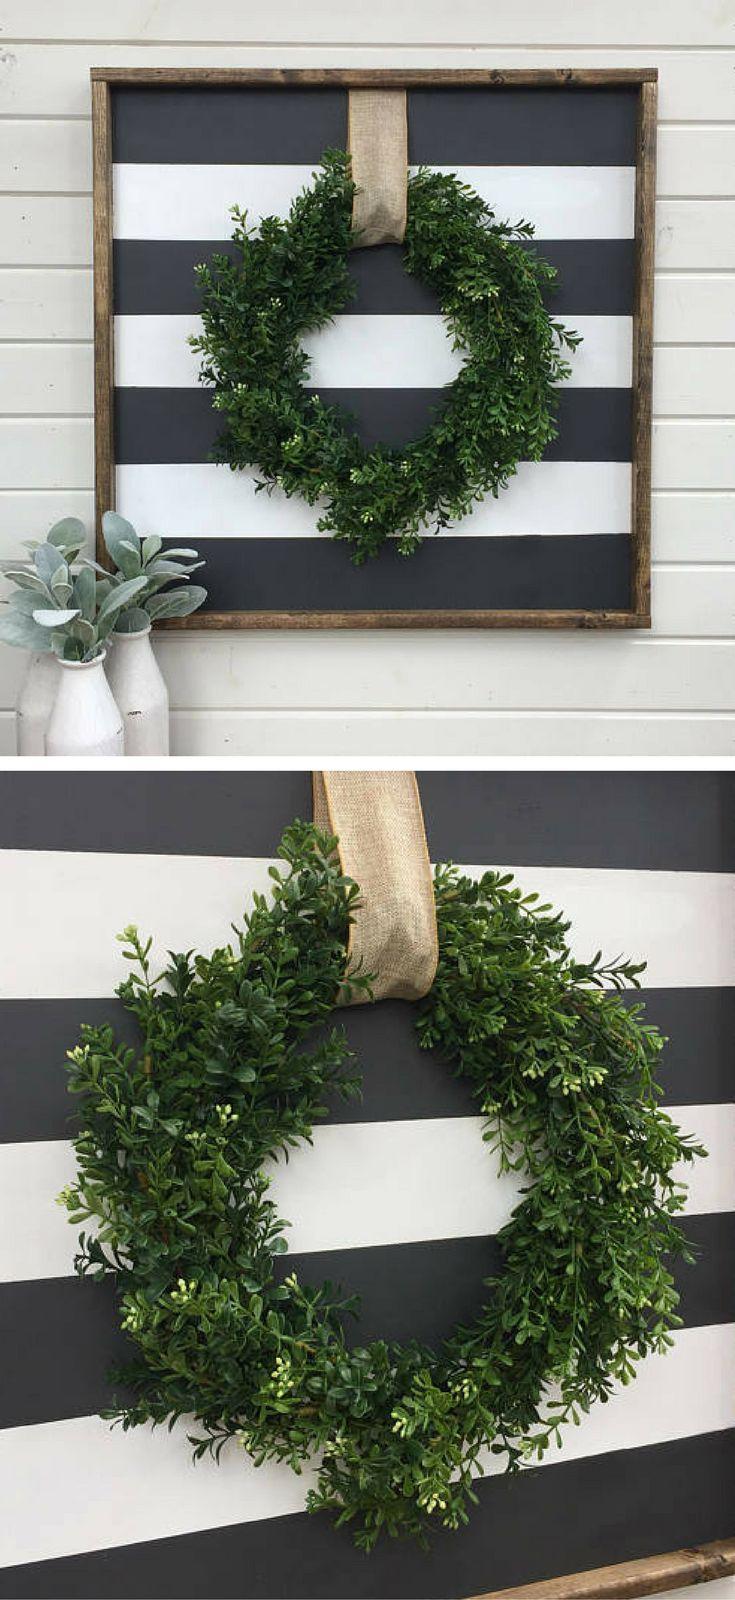 Boxwood wreath framed wood sign   faux boxwreath   black & white striped   rustic decor   farmhouse decor   farmhouse wall decor   stripes   burlap ribbon   shabby chic decor #ad